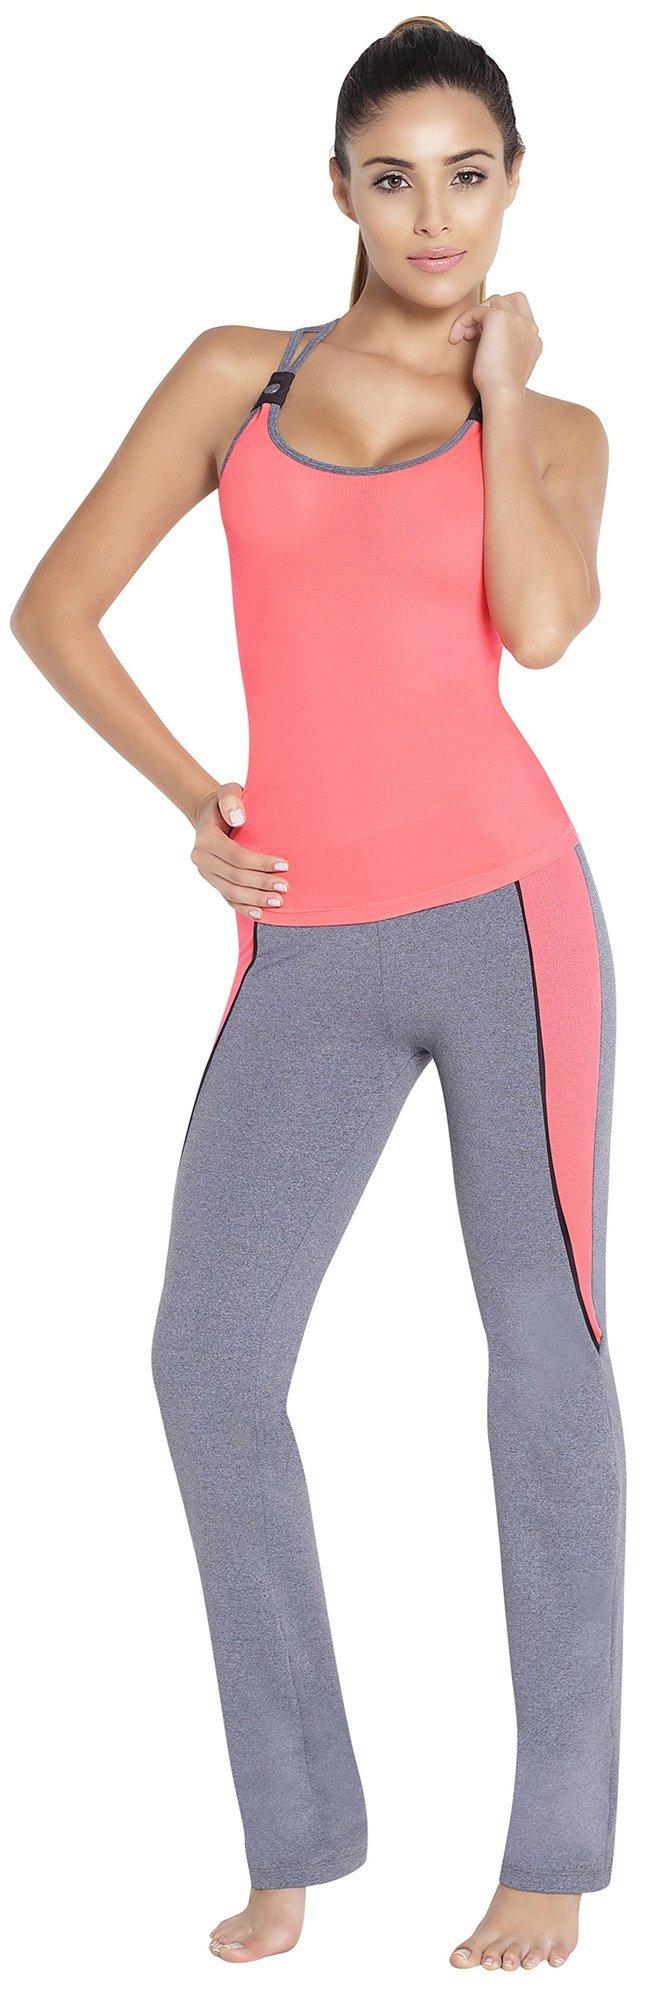 Adriana Arango Women's Gym Outfit Racerback 2 Piece Set Blouse Pants D221 (S) by Adriana Arango